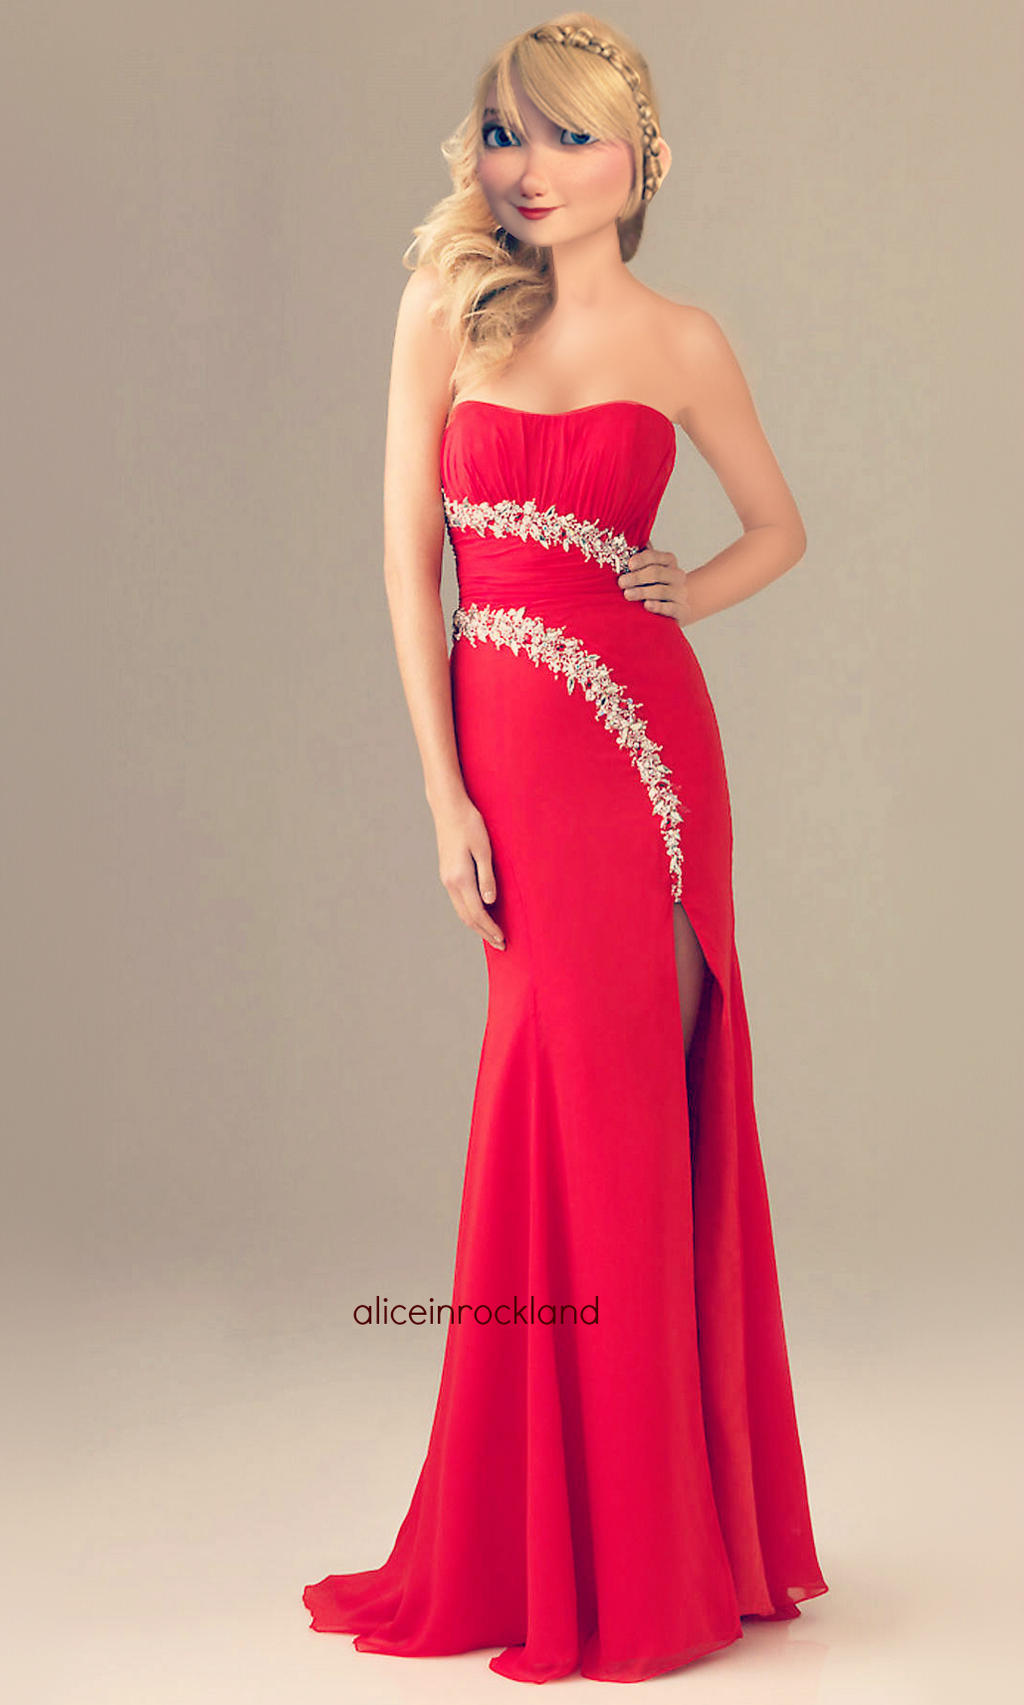 Astrid hofferson red dress by aliceinrockland on deviantart